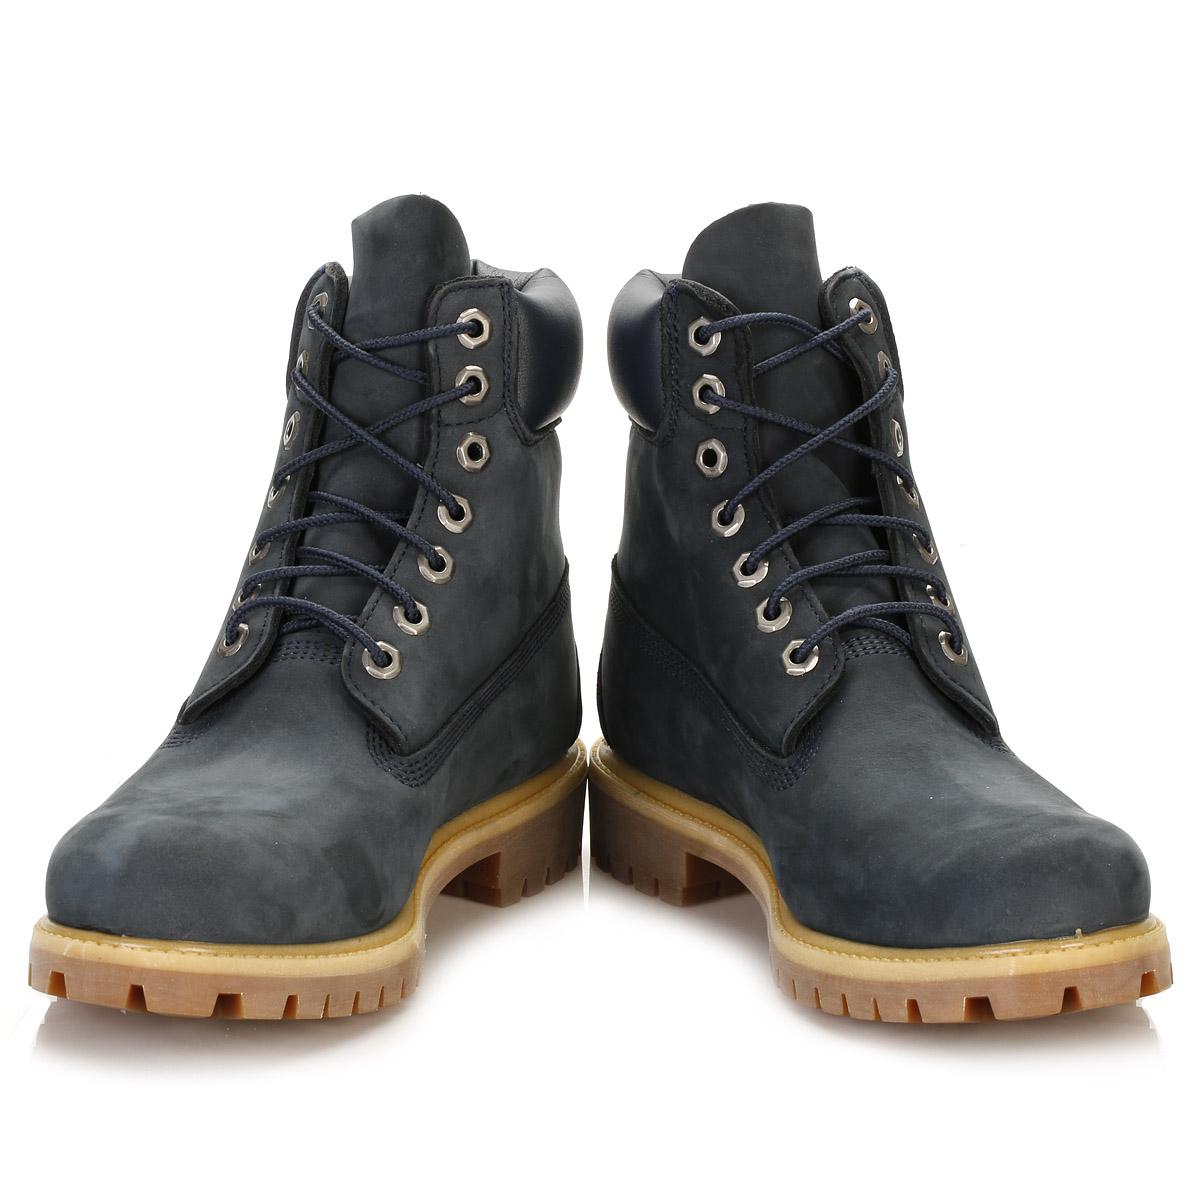 timberland mens navy blue nubuck boots 6 inch waterproof